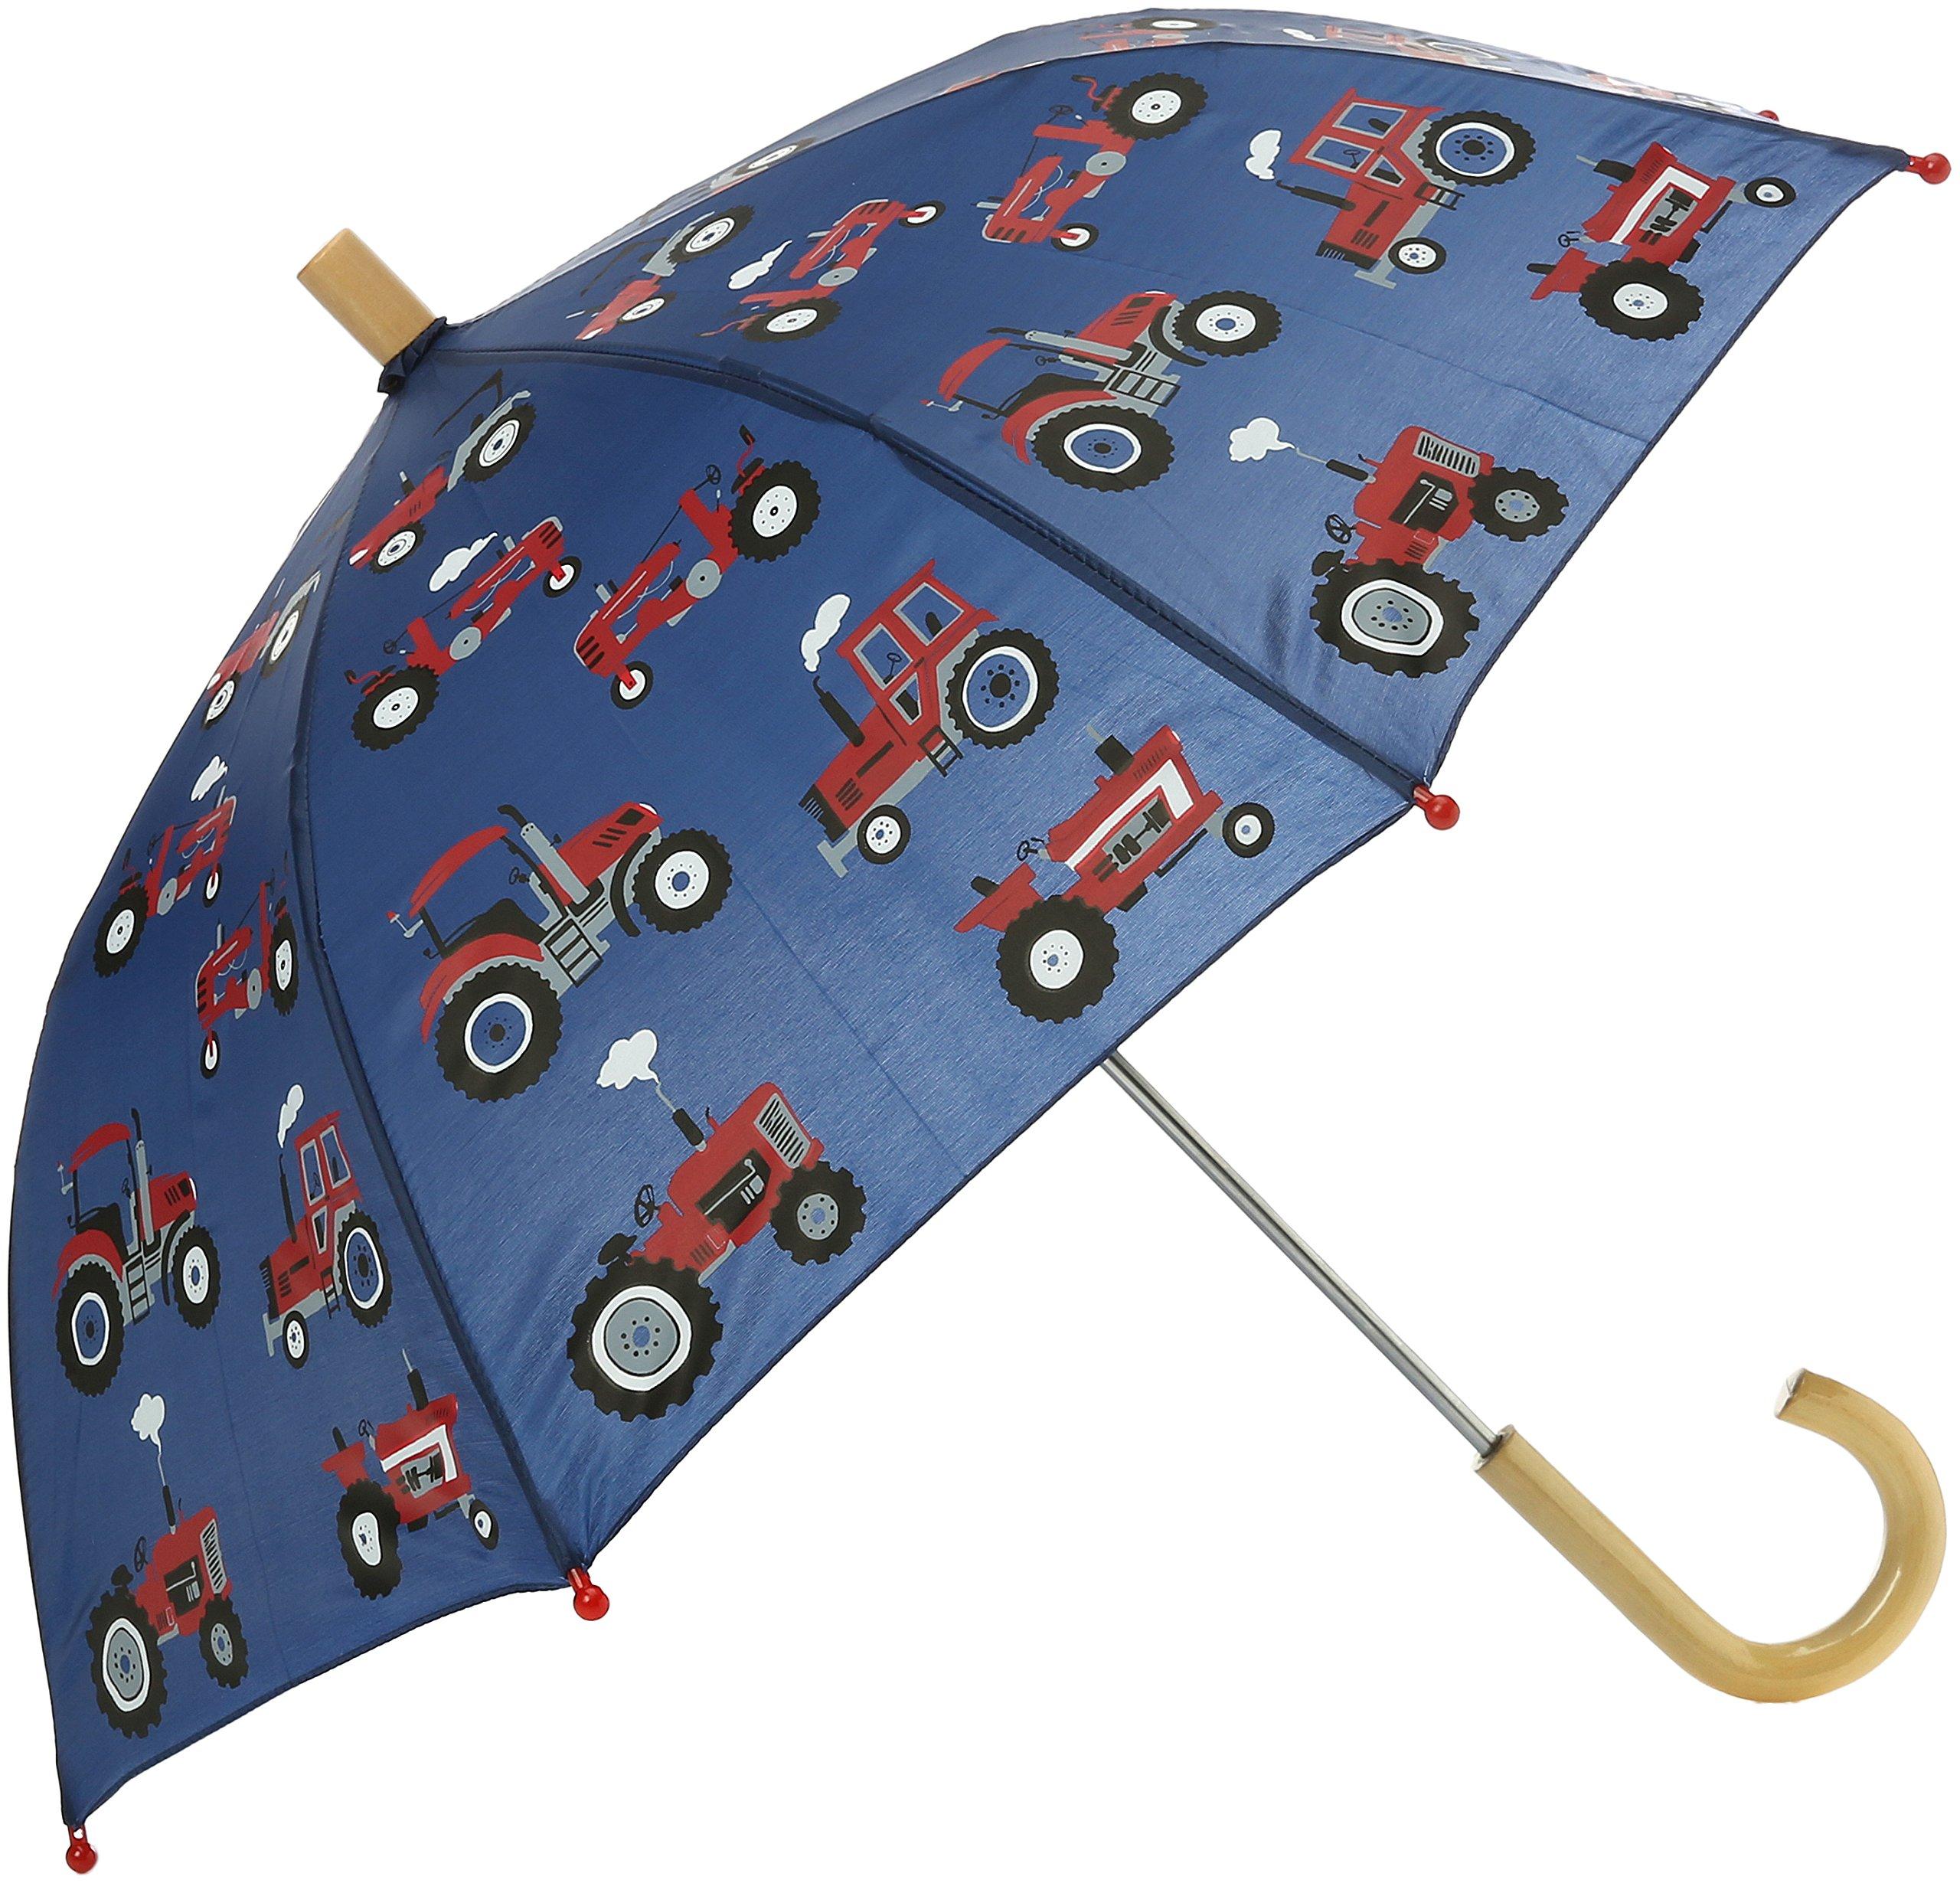 Hatley Little Boys' Printed Umbrellas, Red Farm Tractors, One Size